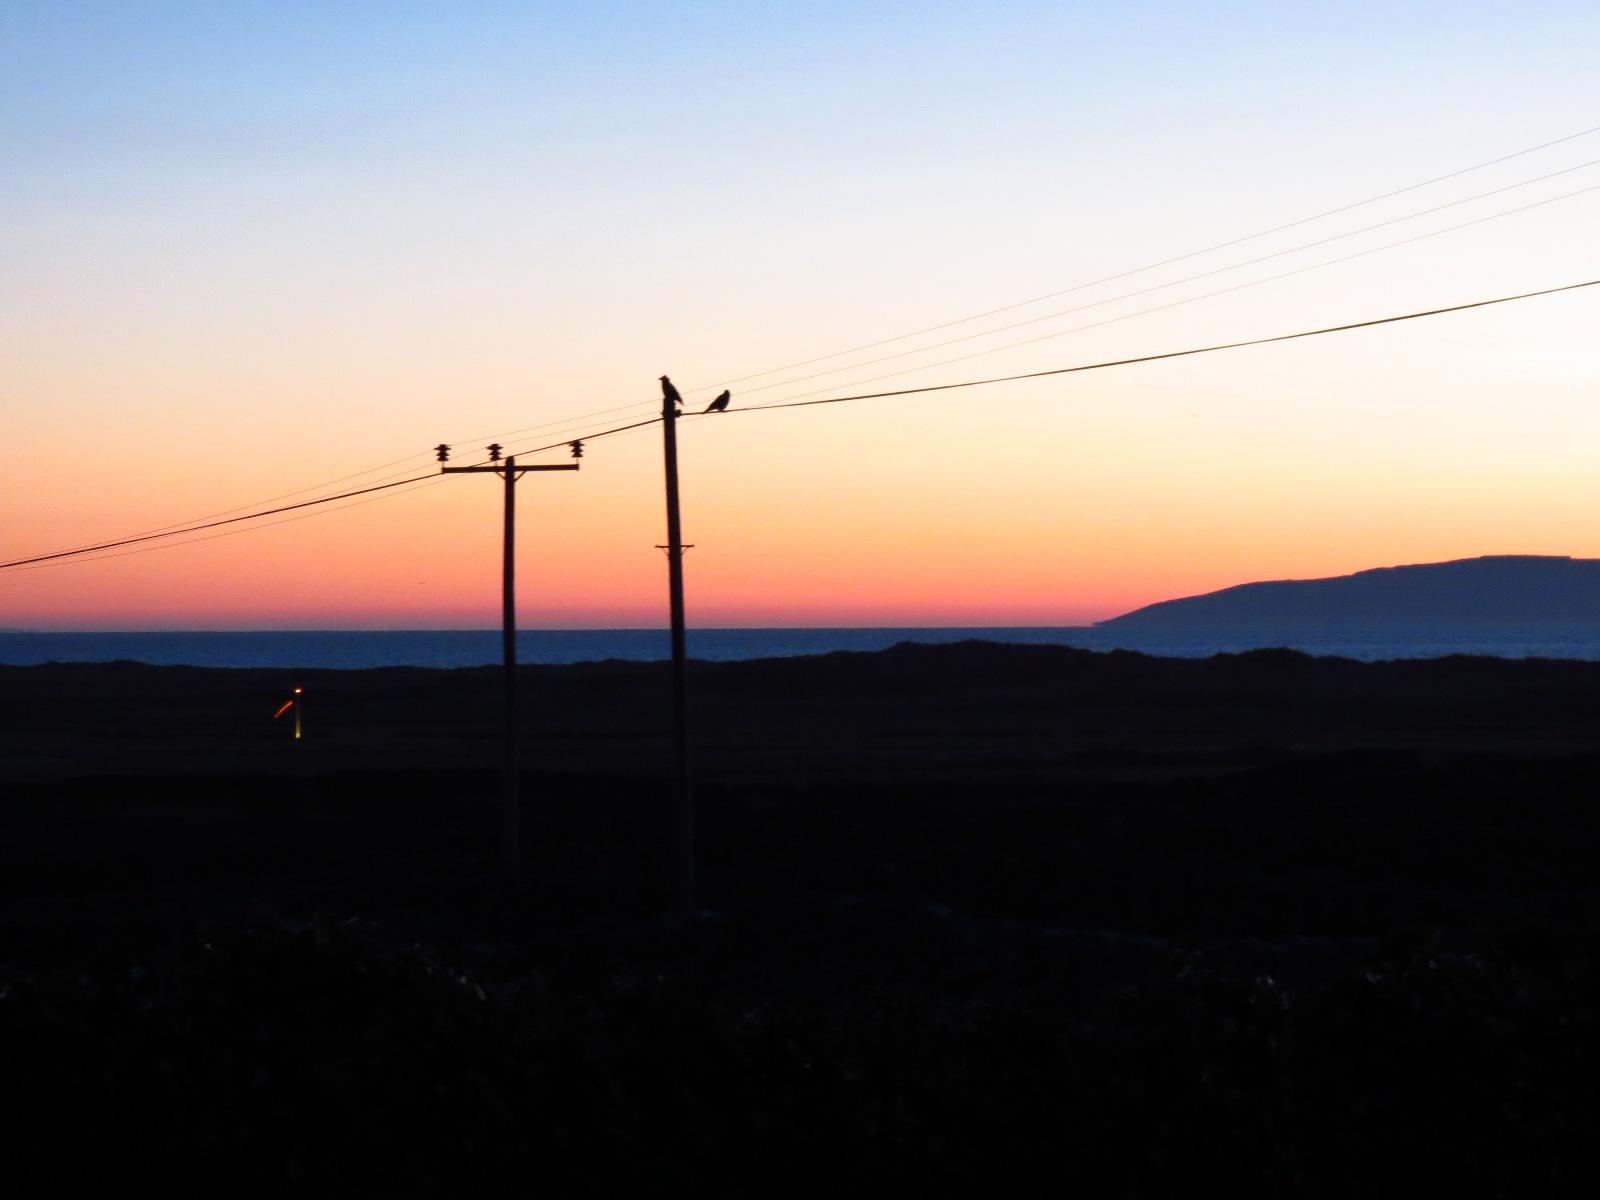 sunrise 25 Feb 2013 (5)